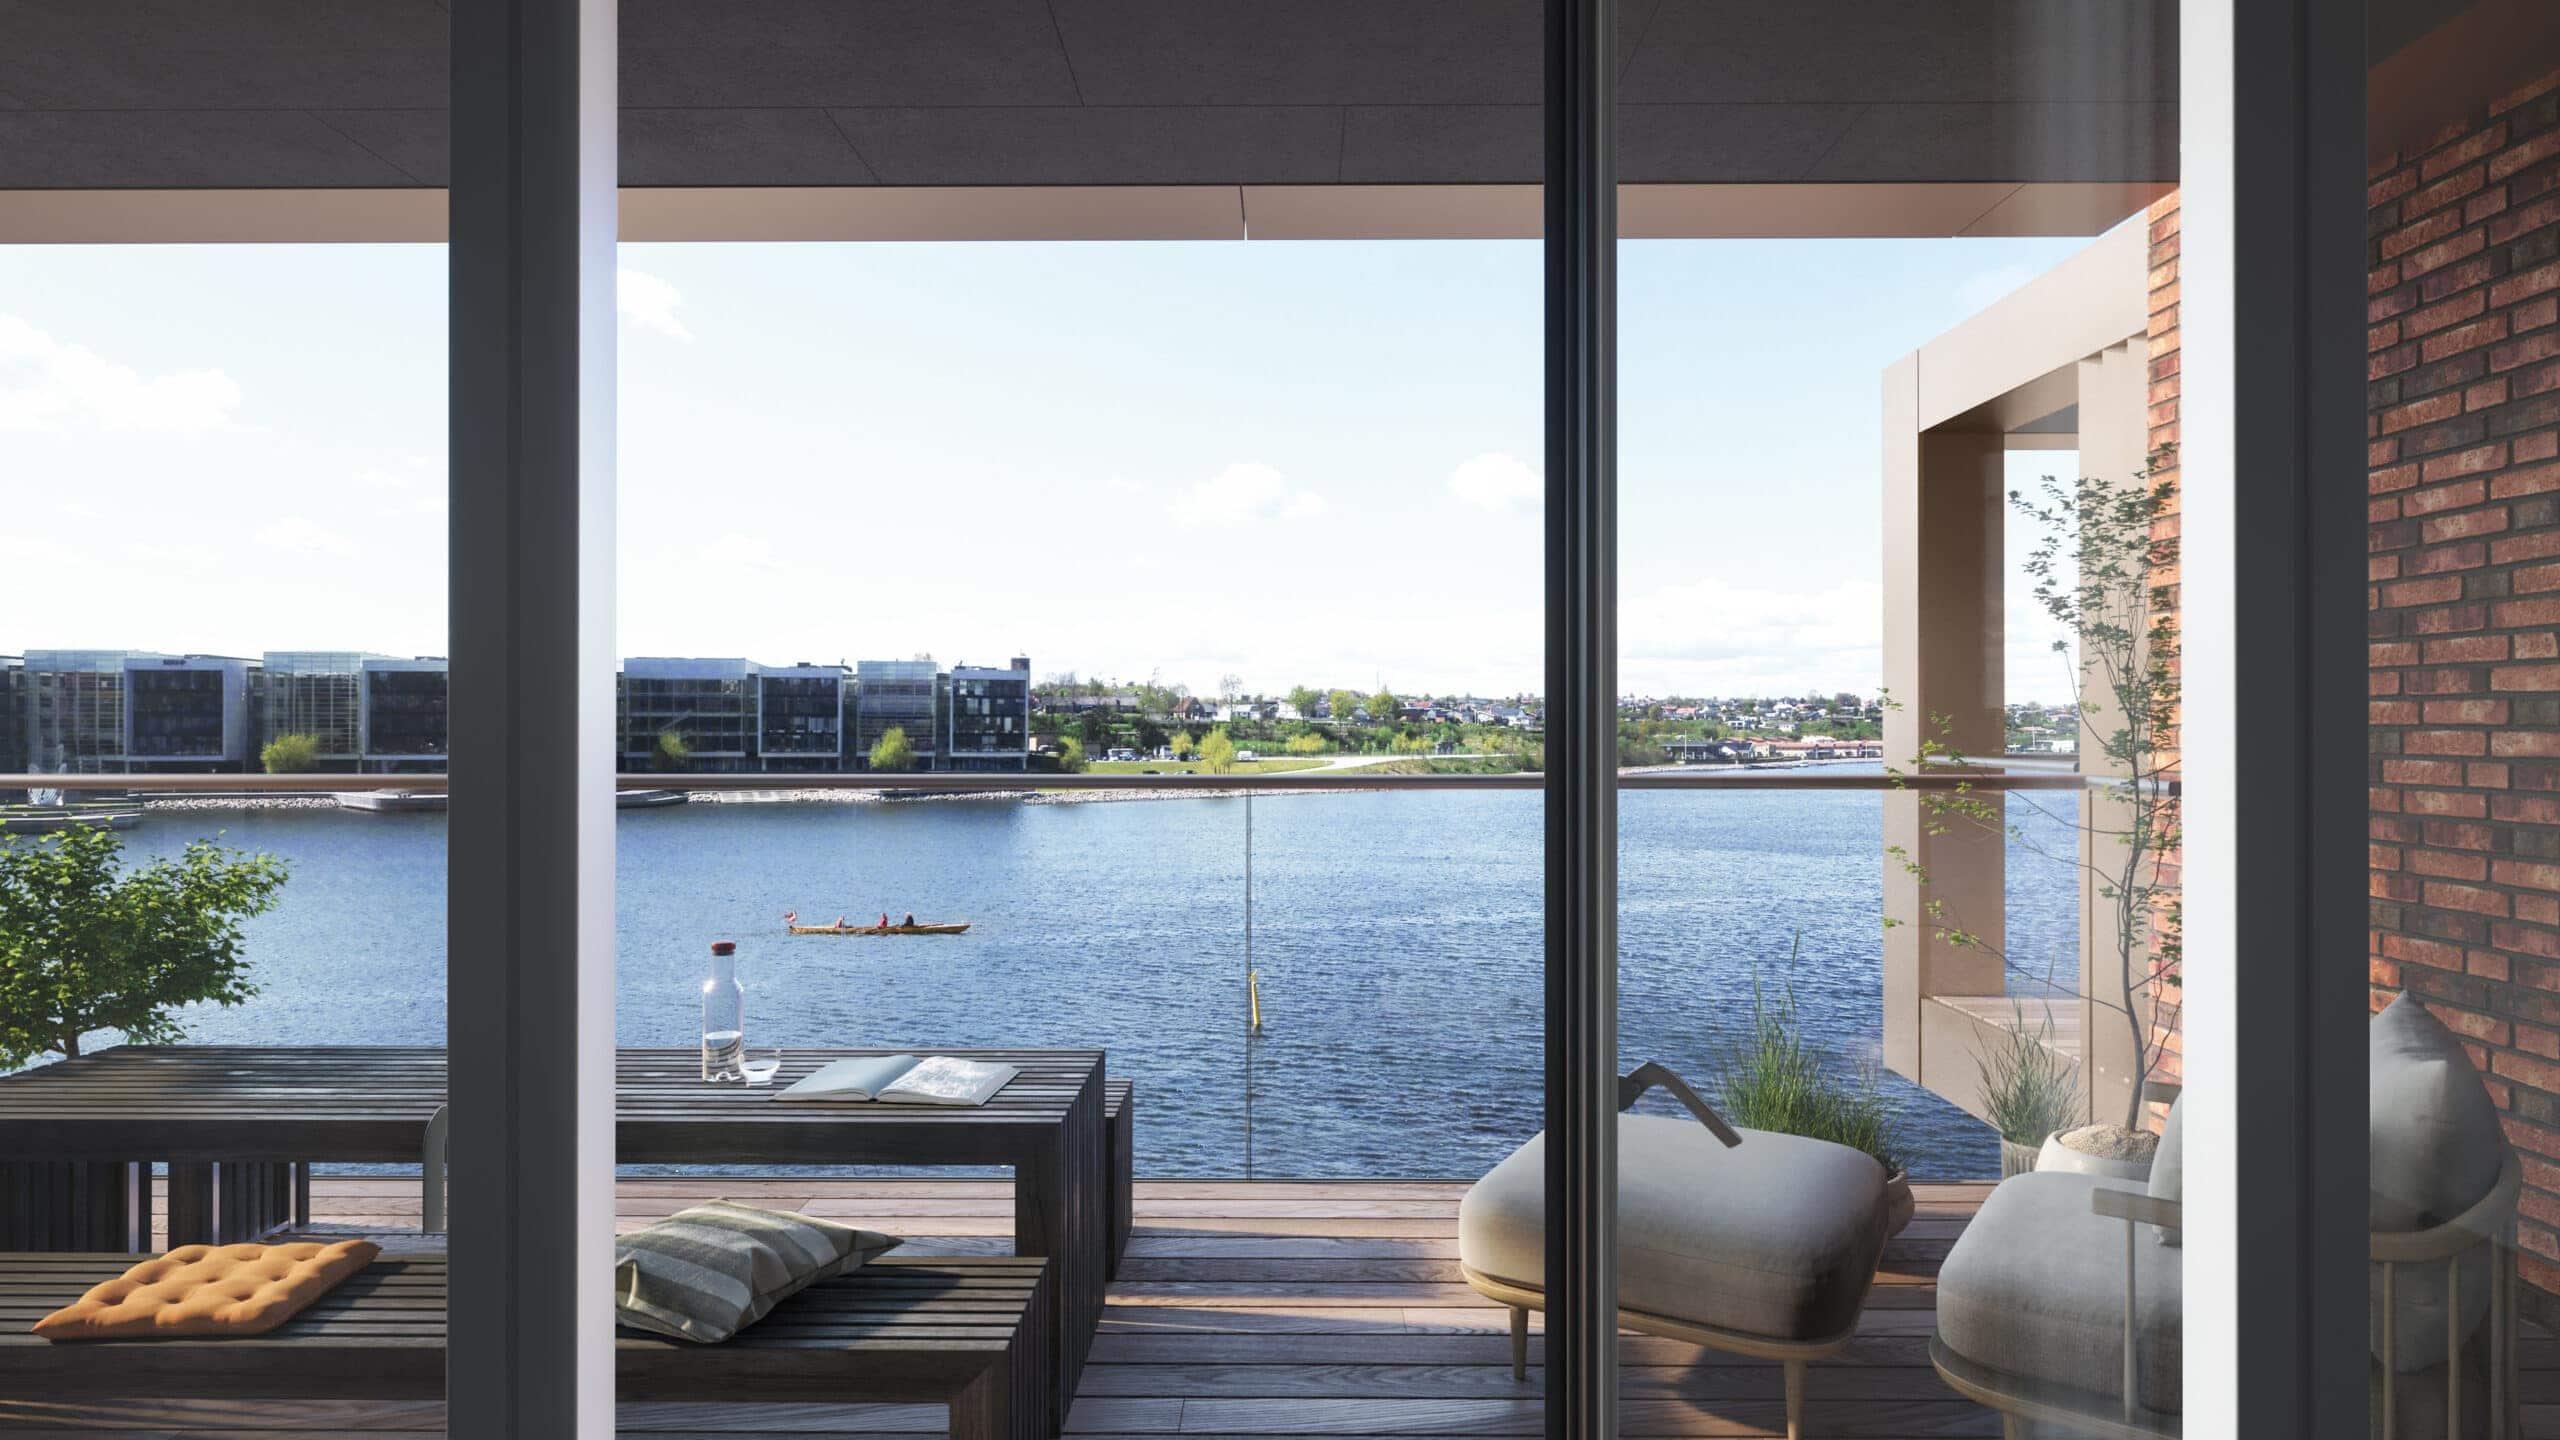 1728_A_Enggaard_Kongebro-Huset-i-Soenderborg_INT_Lejlighed21_TypeC_3sal_001_Altan